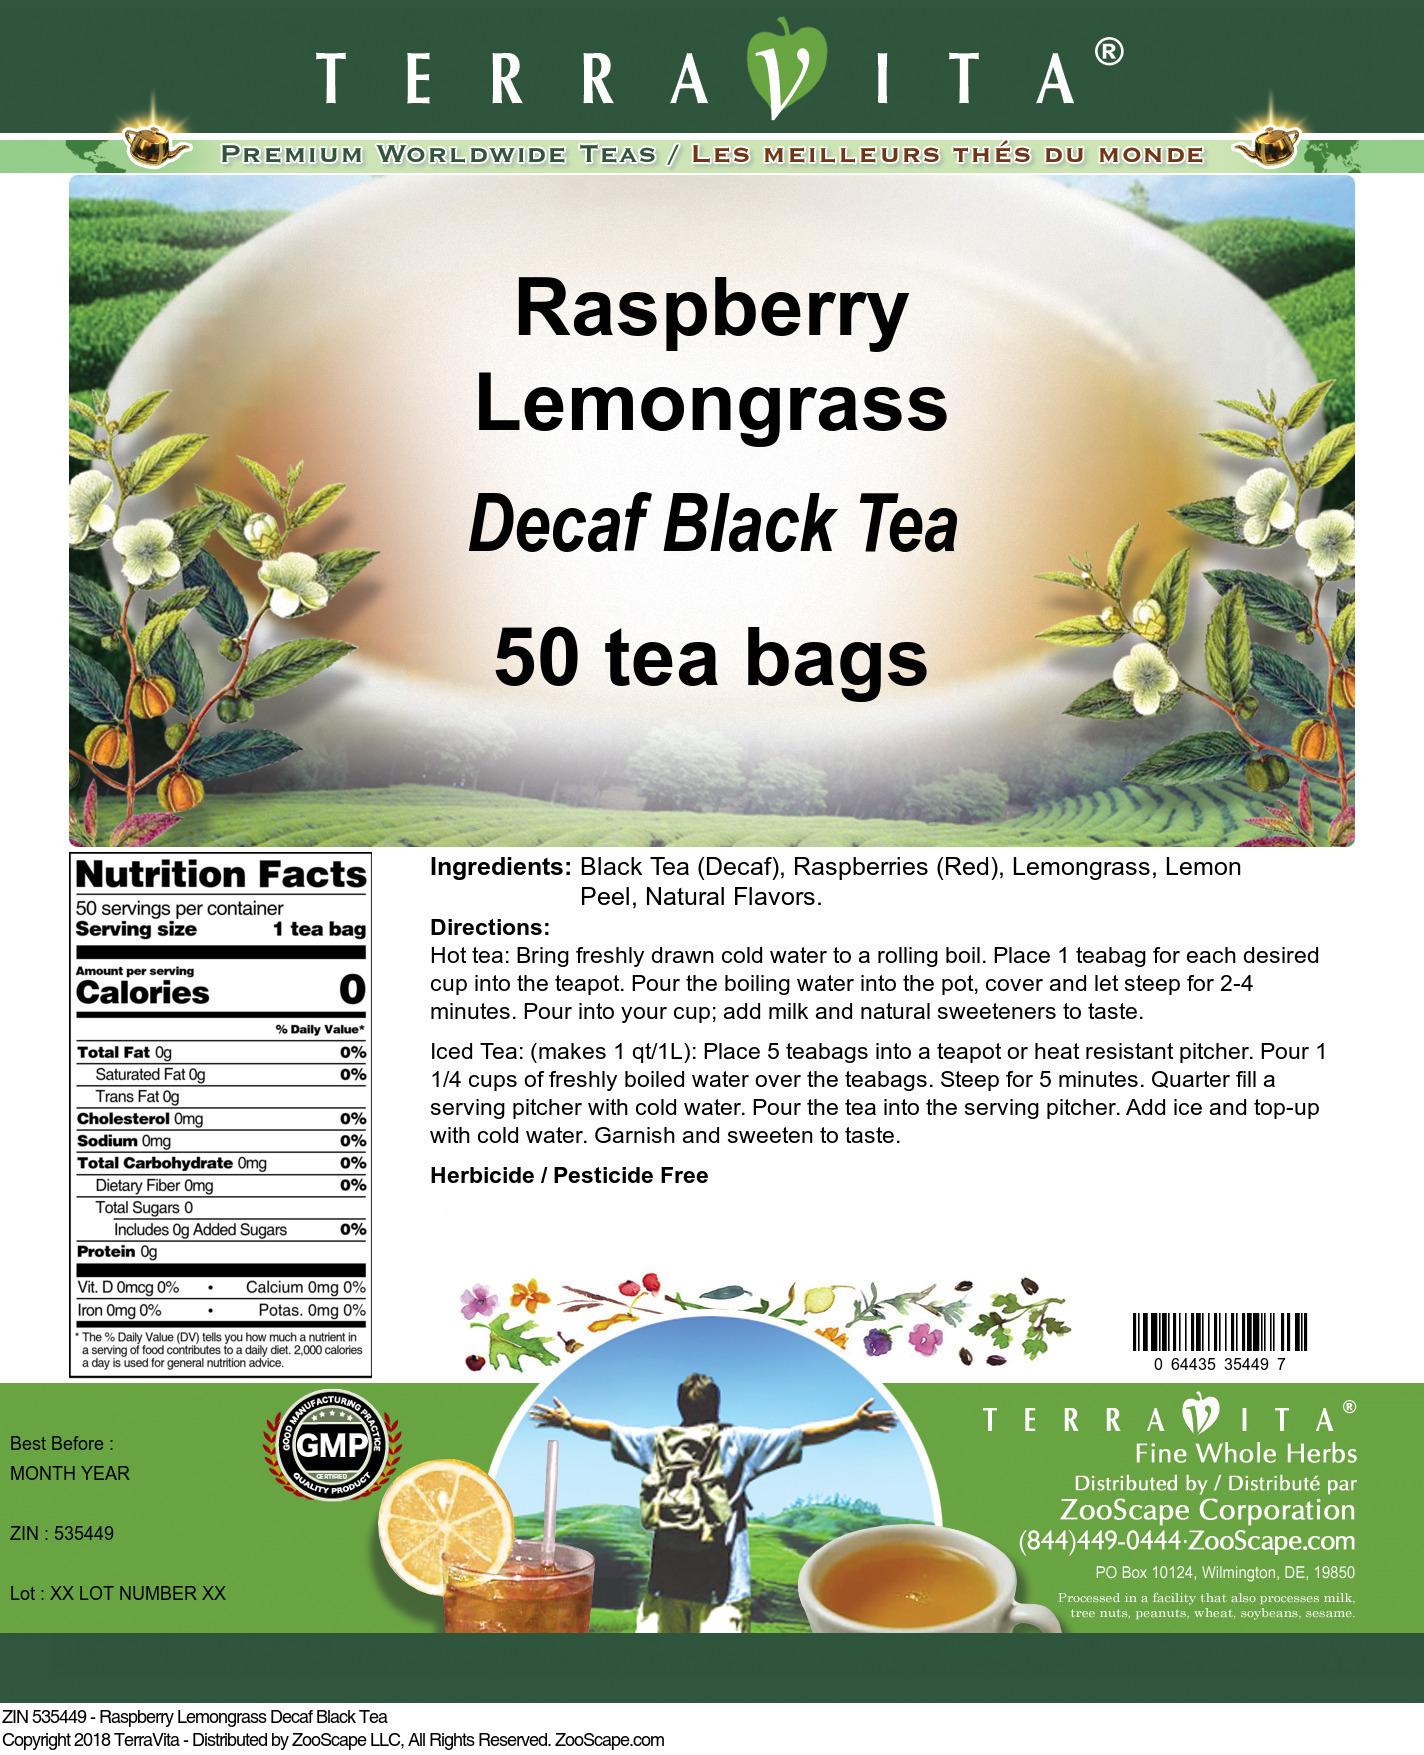 Raspberry Lemongrass Decaf Black Tea